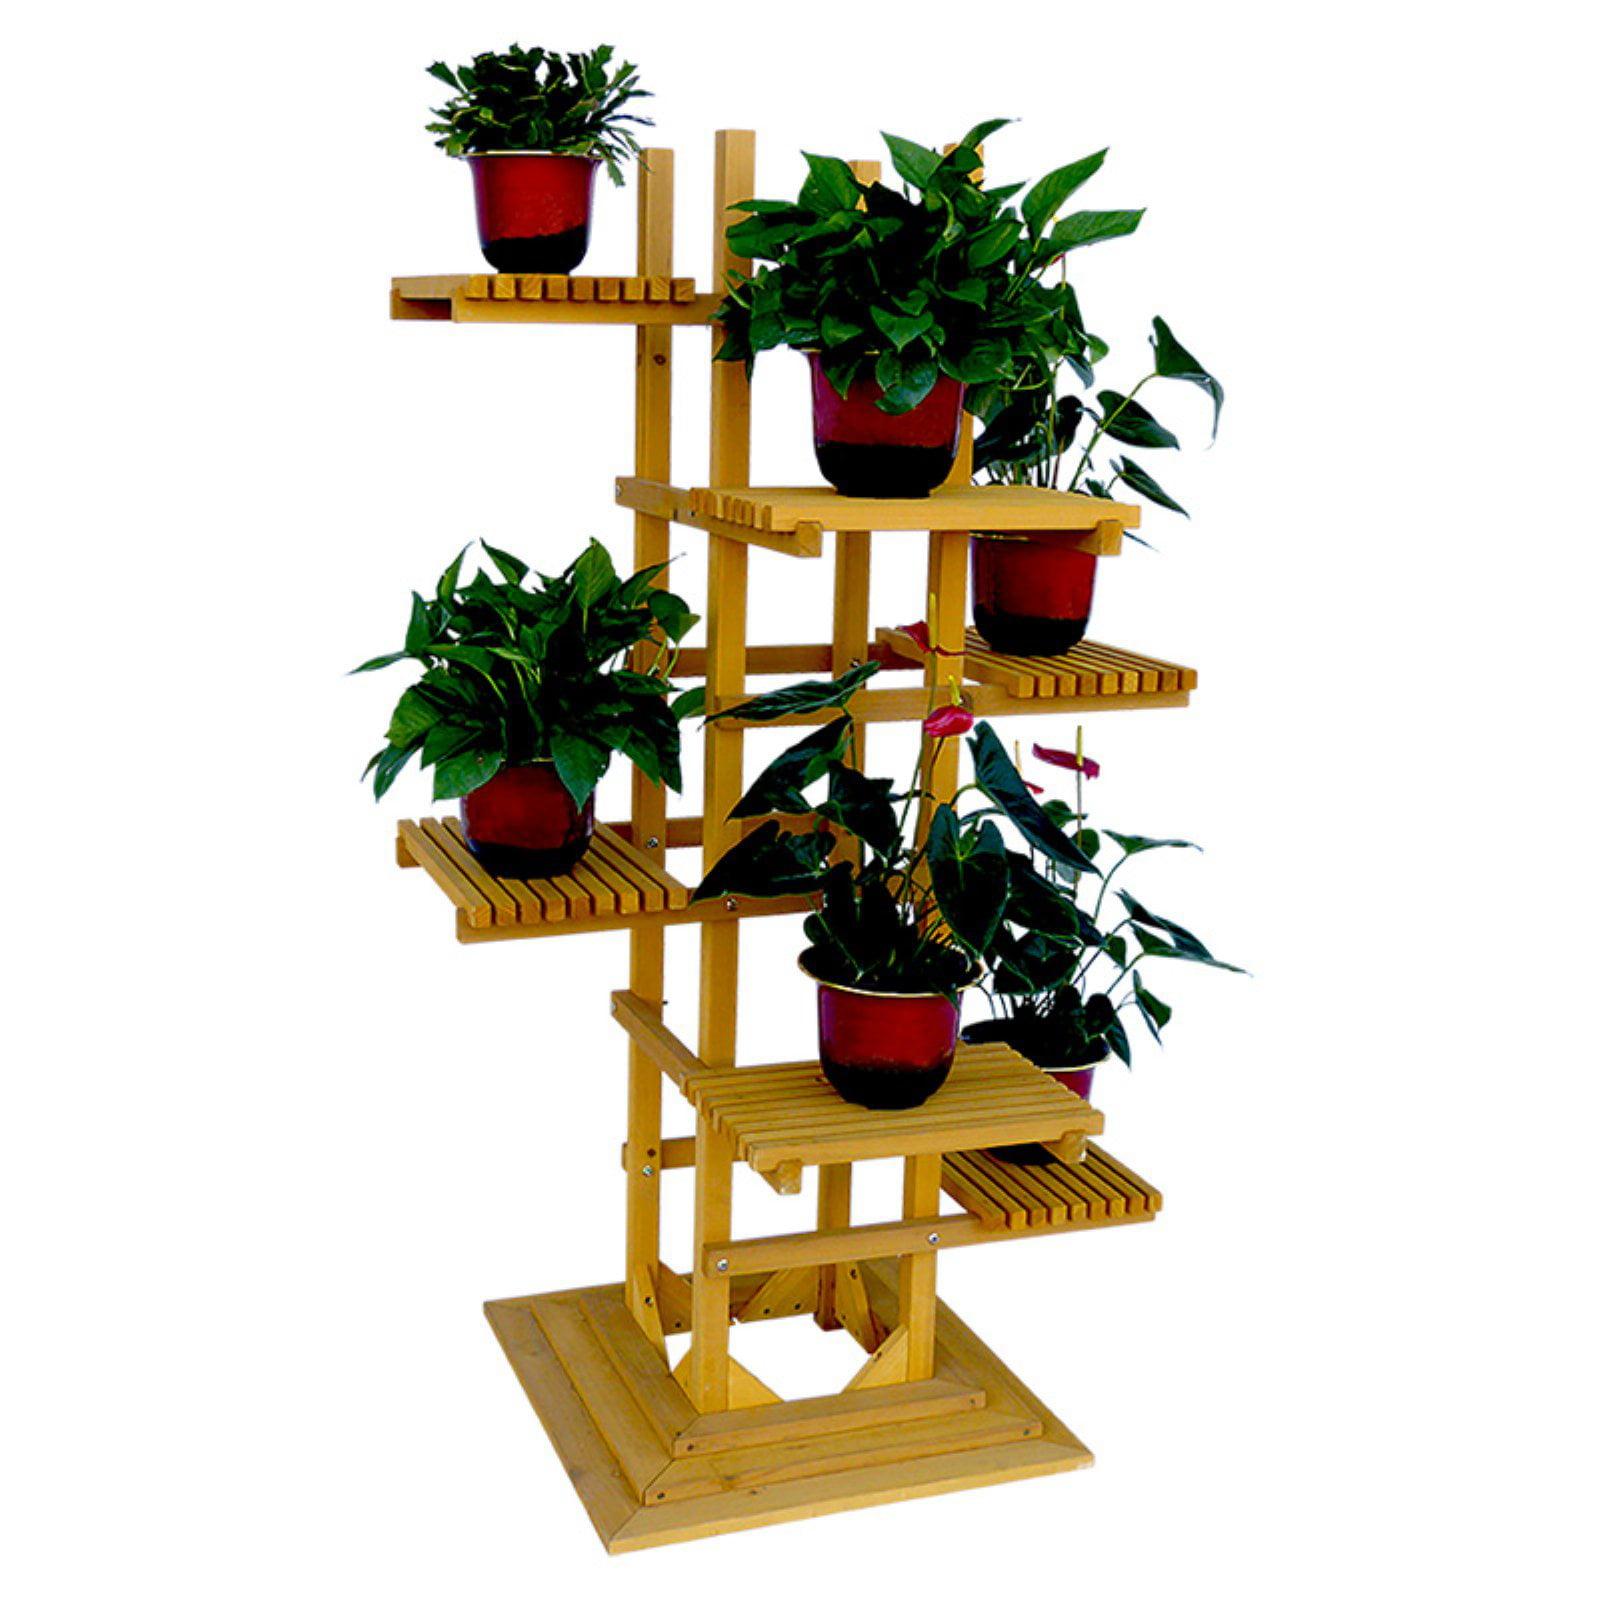 Leisure Season 6 Tier Pedestal Plant Stand